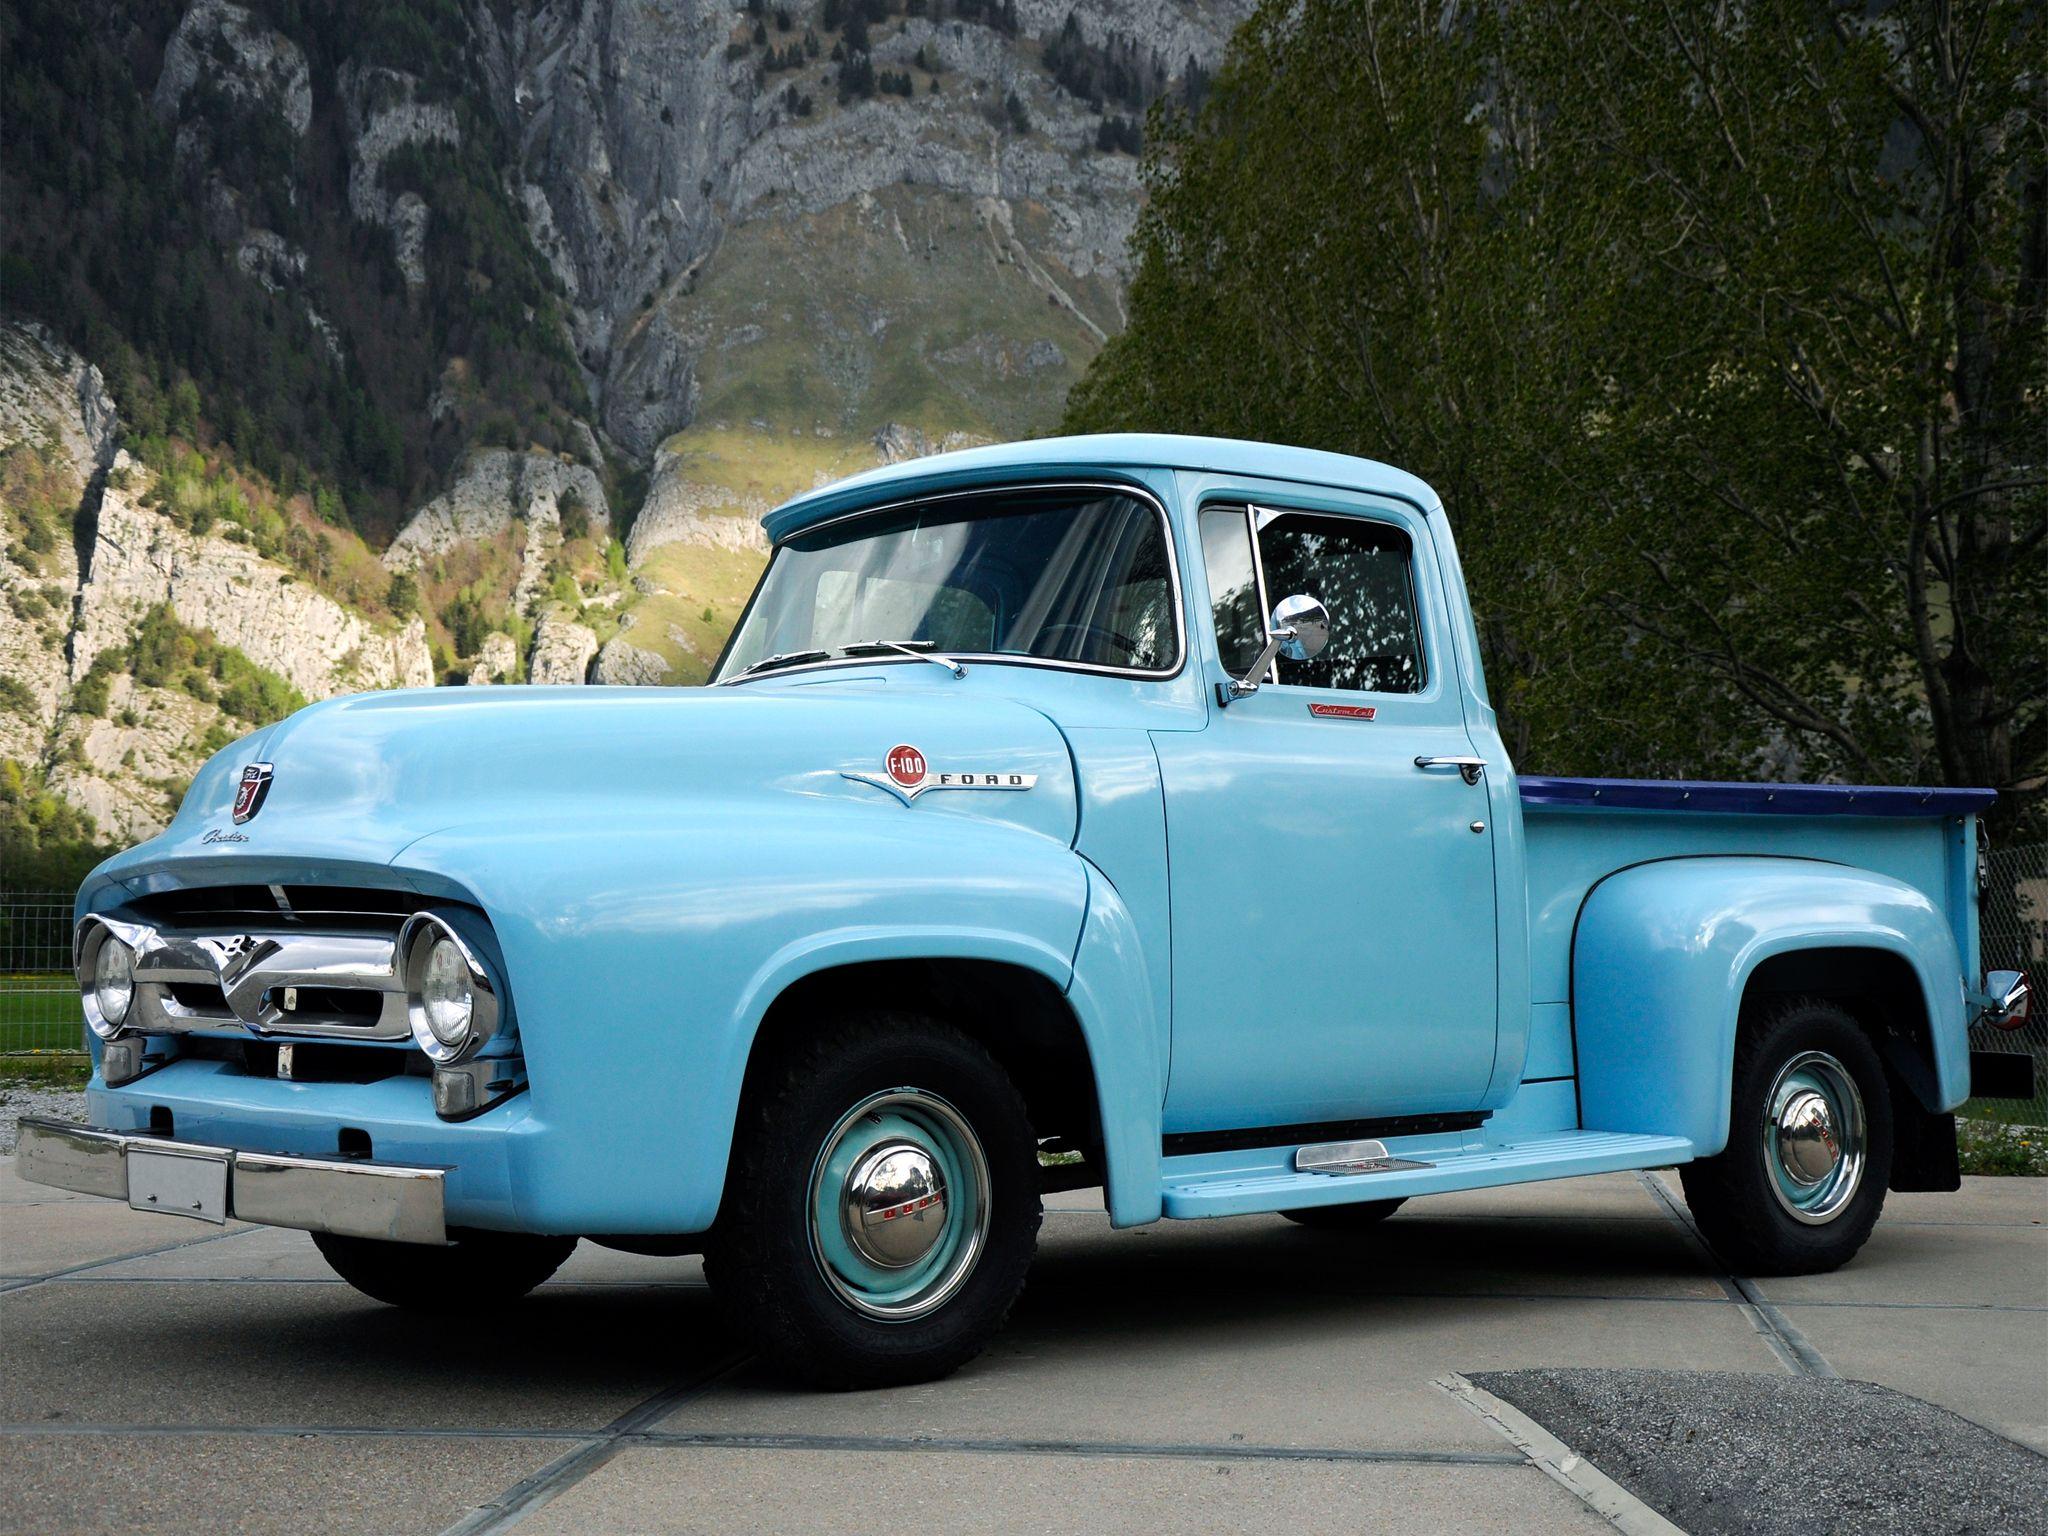 1956 Ford F 100 Custom Cab Pickup Retro H Wallpaper 2048x1536 142322 Vintage Pickup Trucks 1956 Ford Truck Vintage Trucks